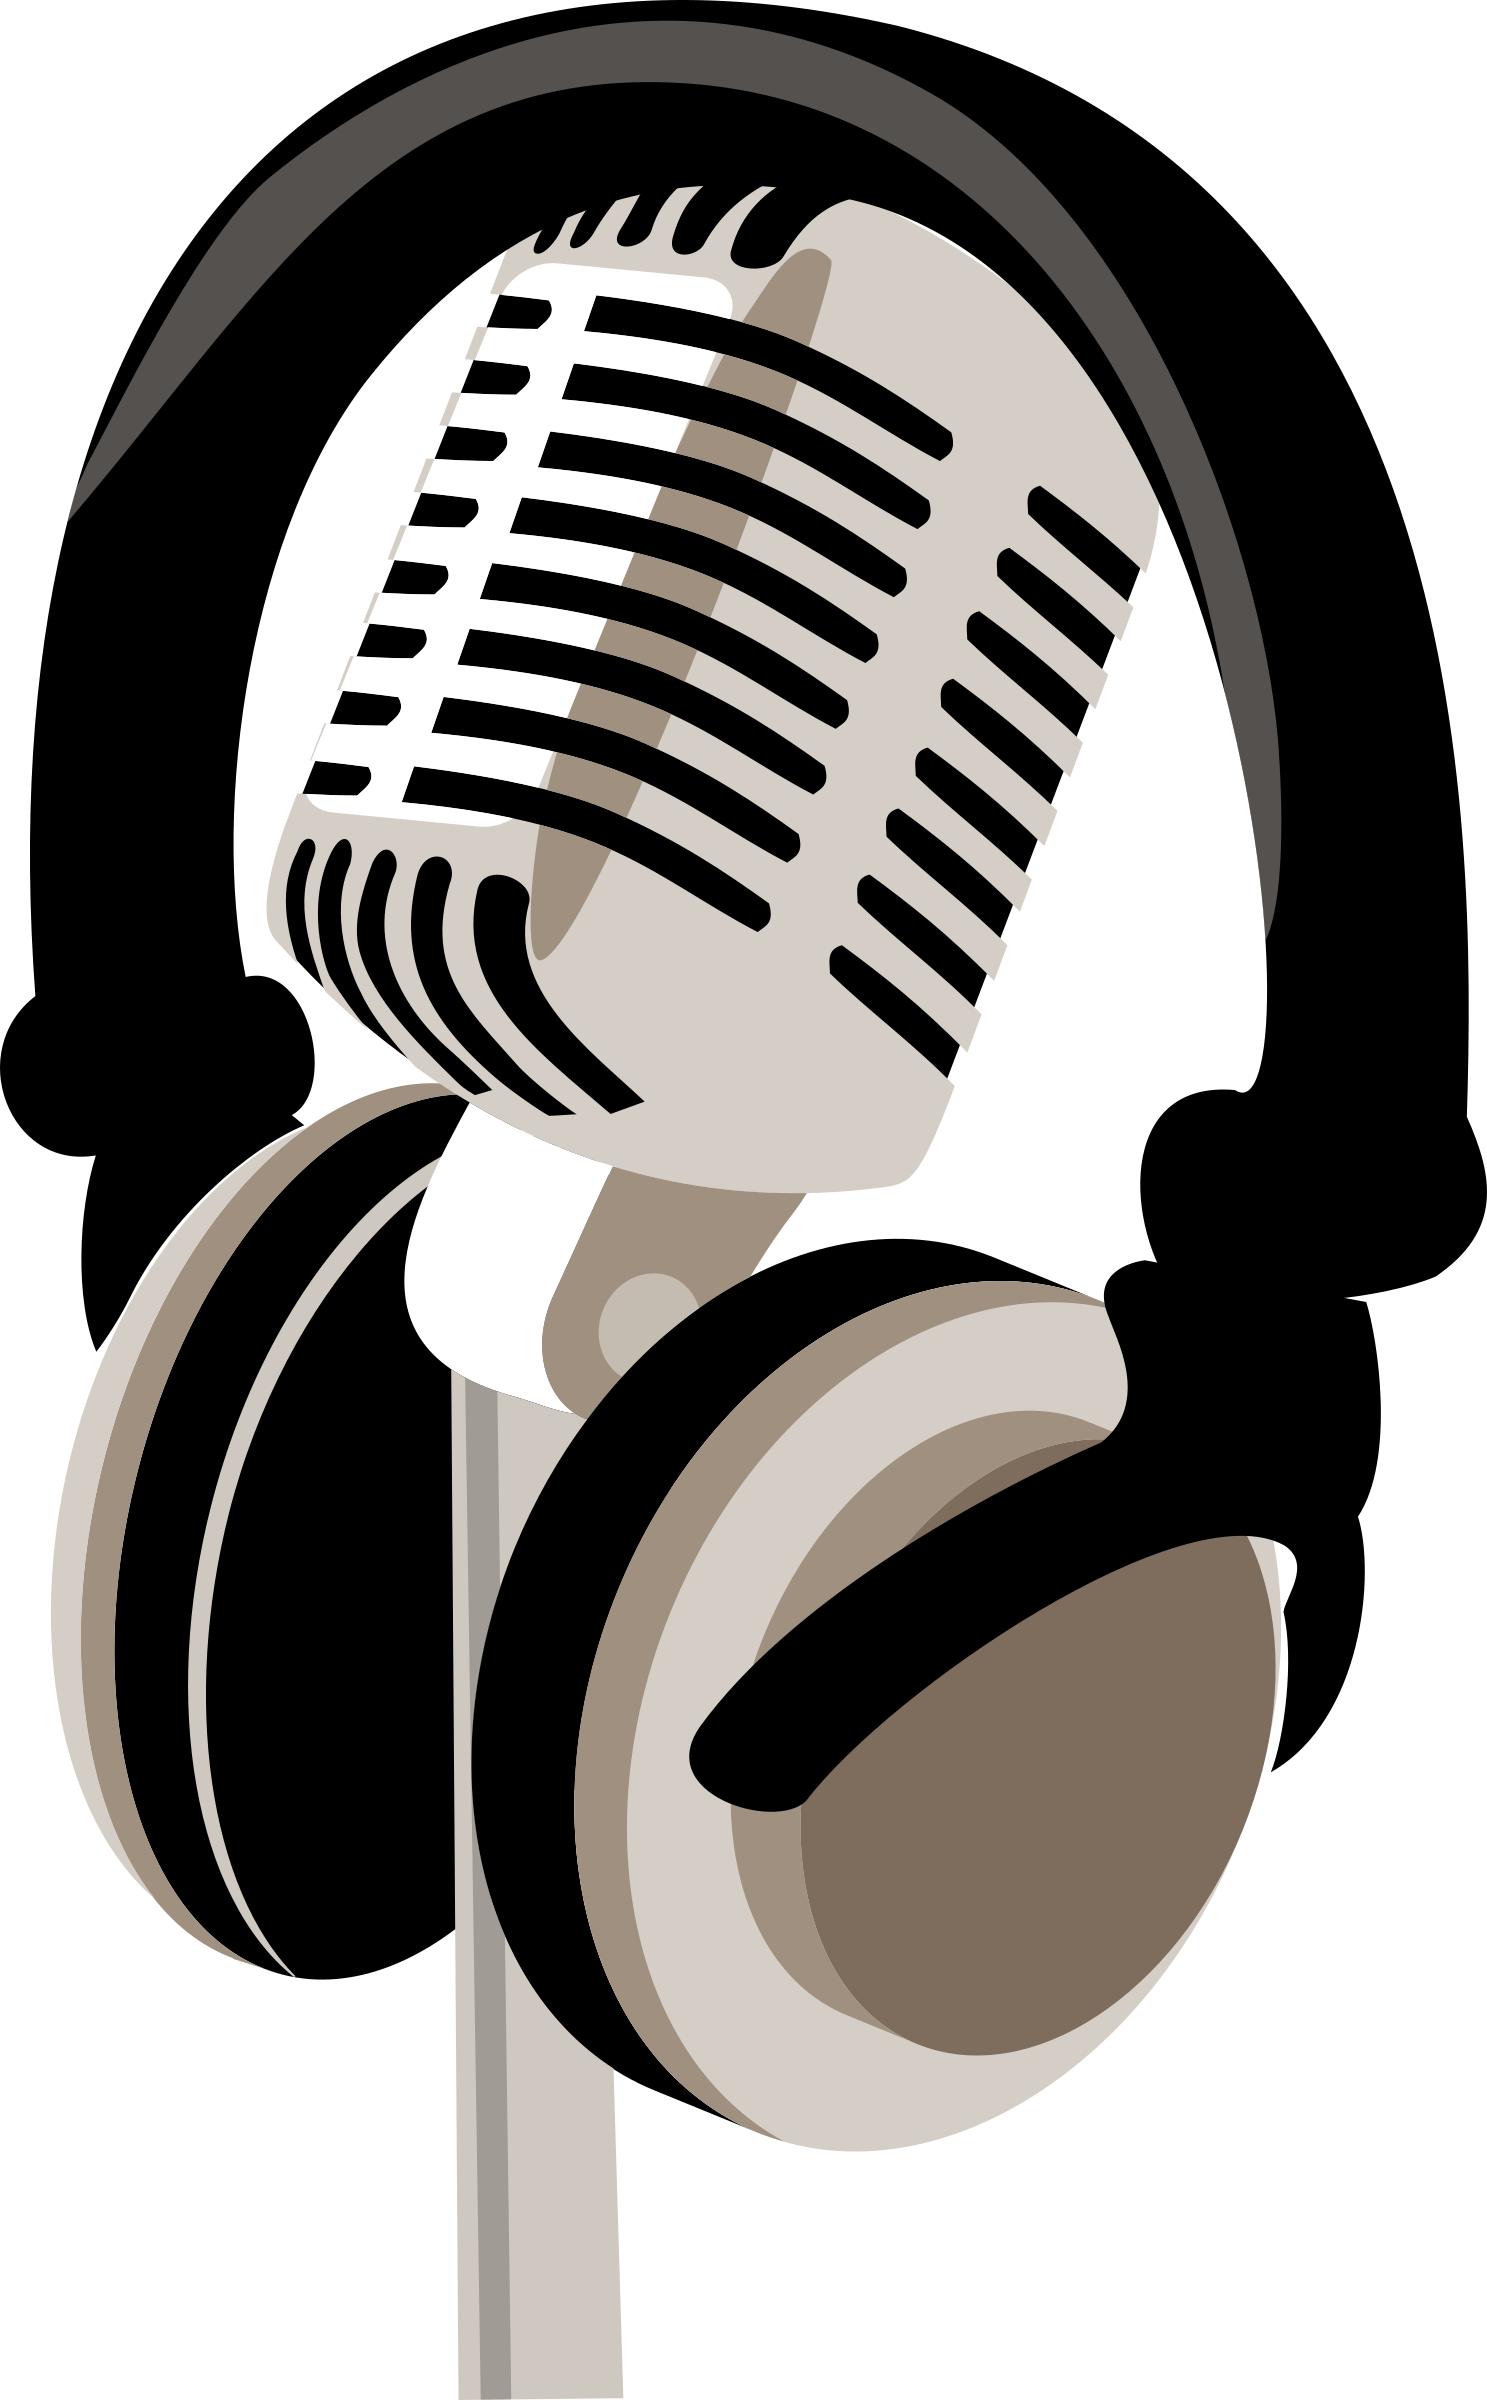 Headphone clipart retro And microphone retro headphones Clipart